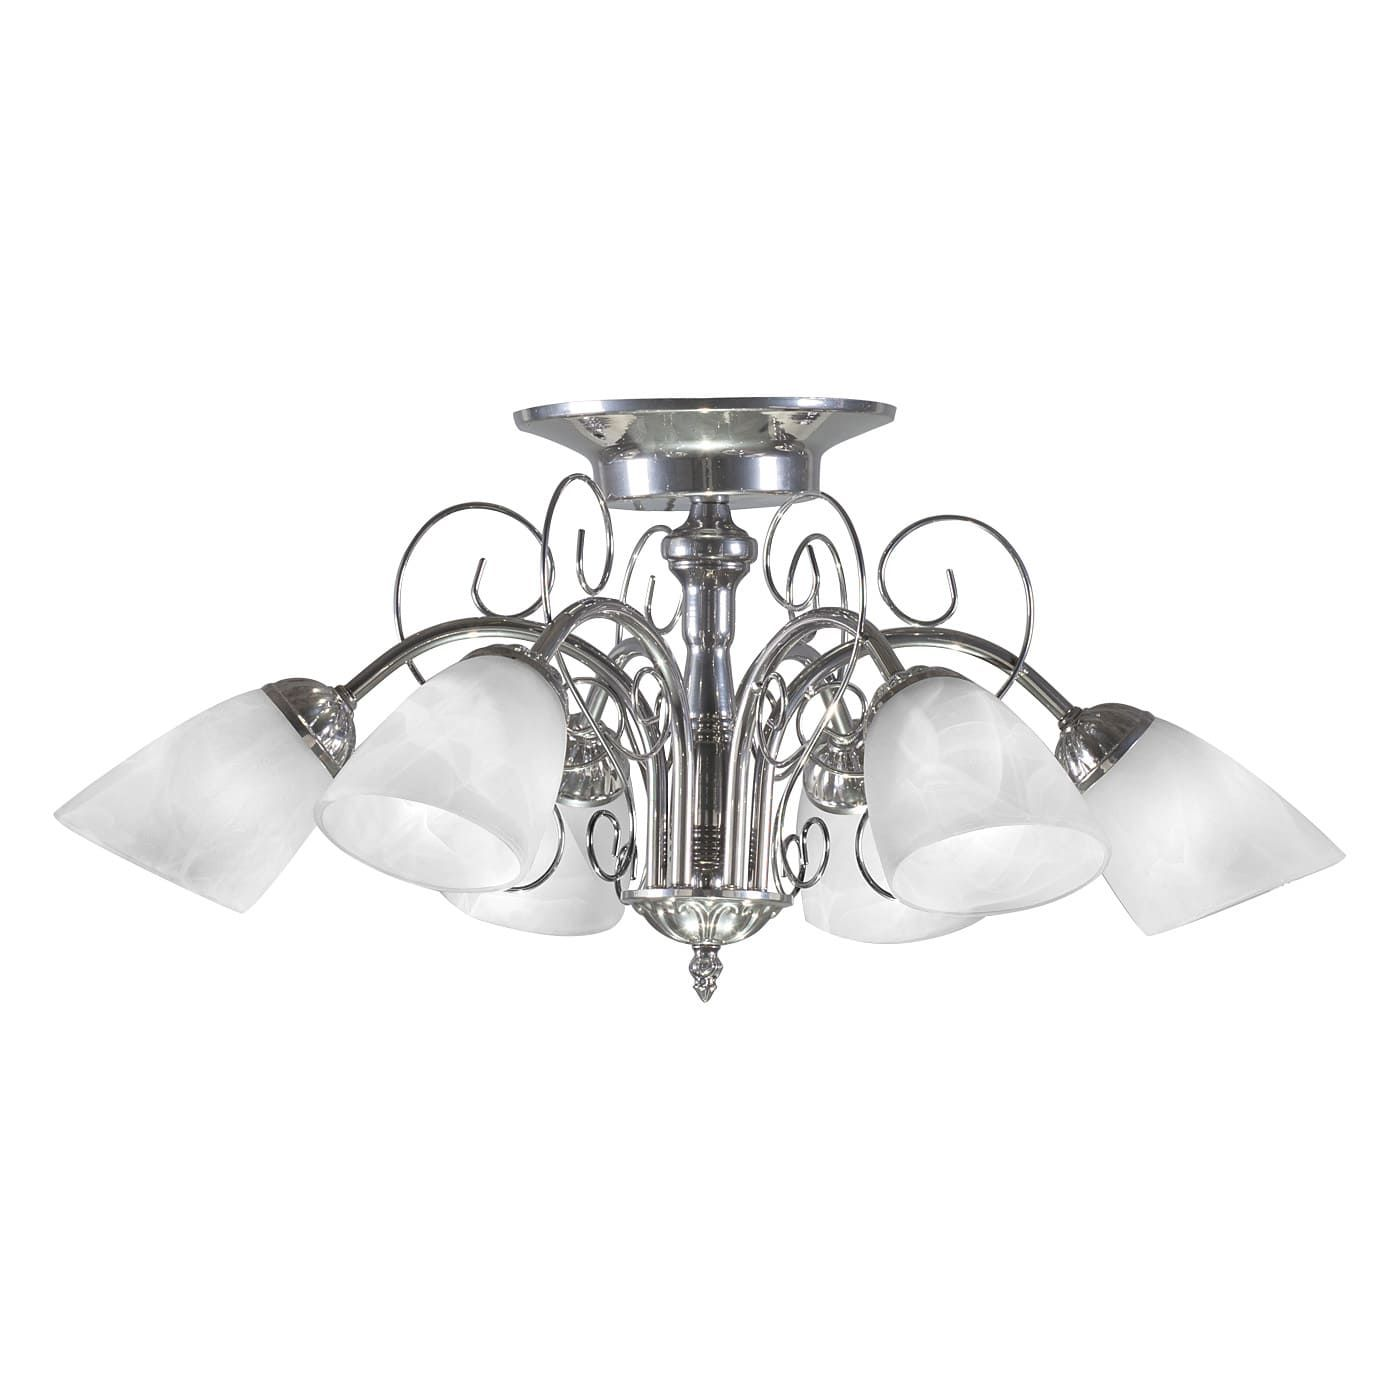 PETRASVET / Ceiling chandelier S2122-6, 6xE14 max. 60W